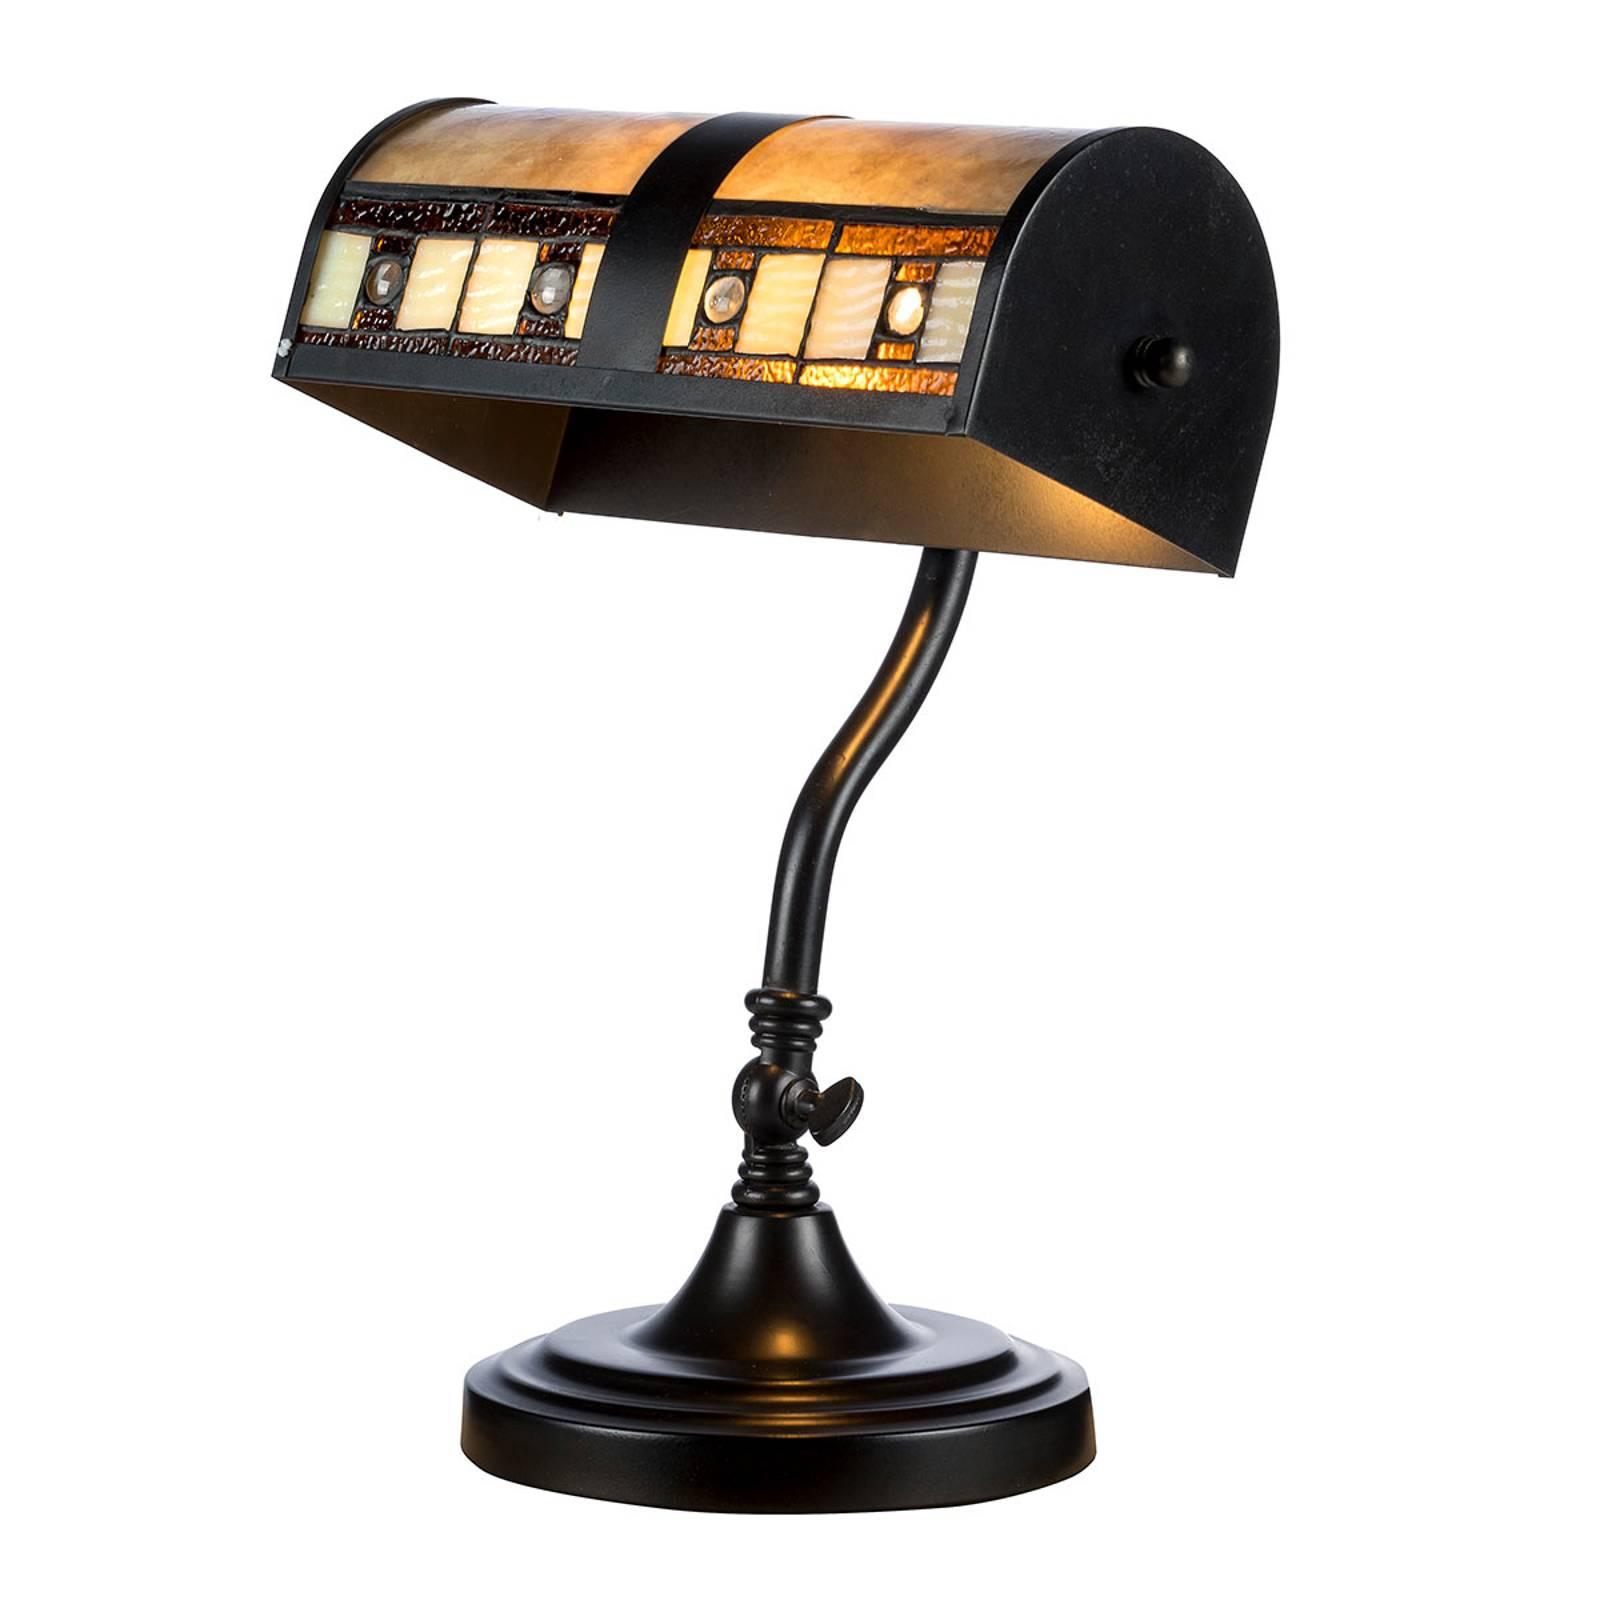 Tafellamp KT4613 in Tiffany-design